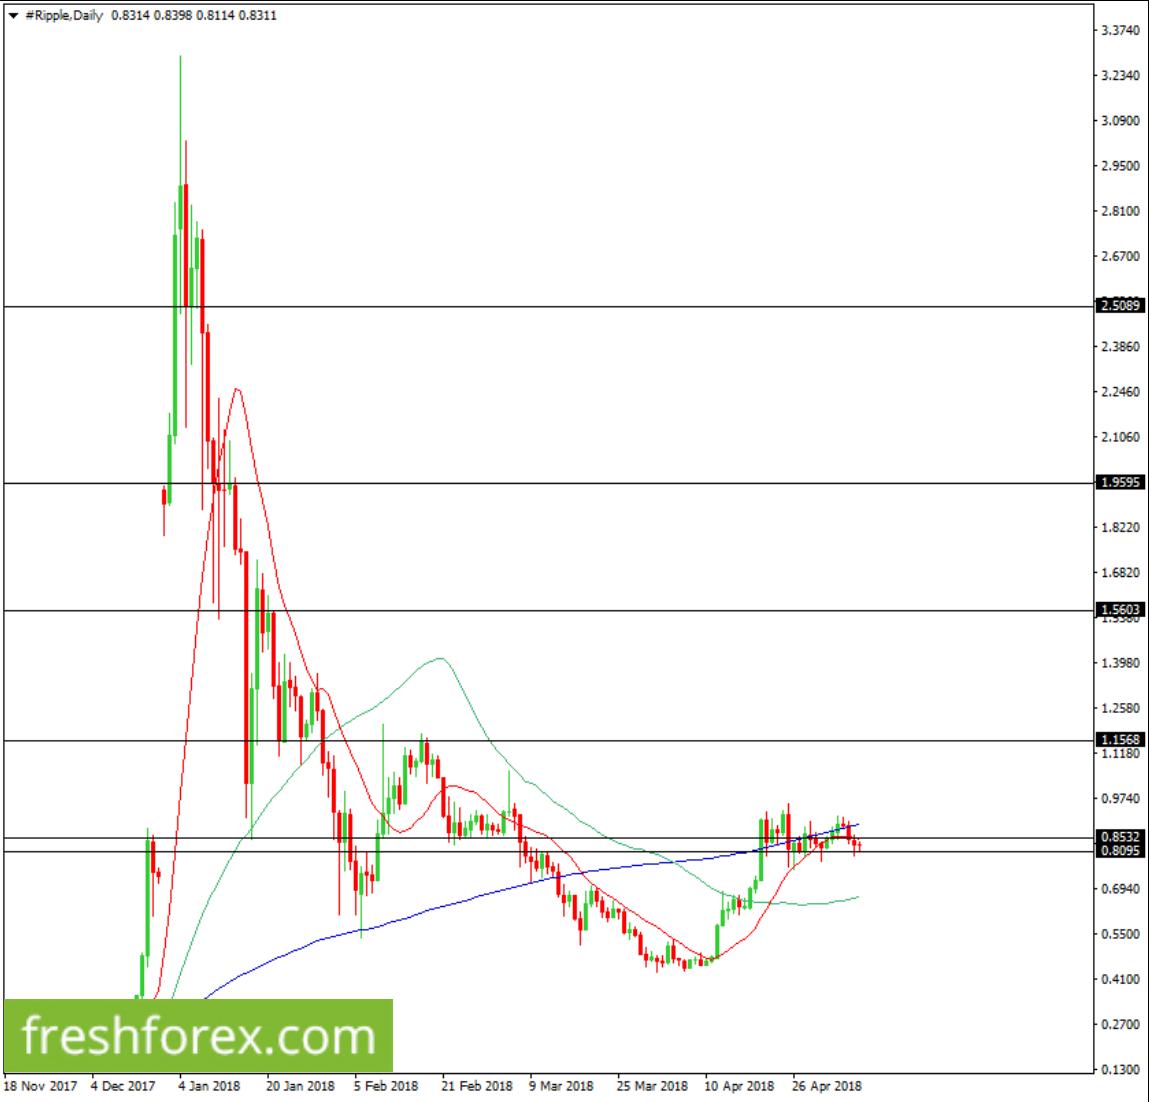 Buy XRP now towards $1.1568.